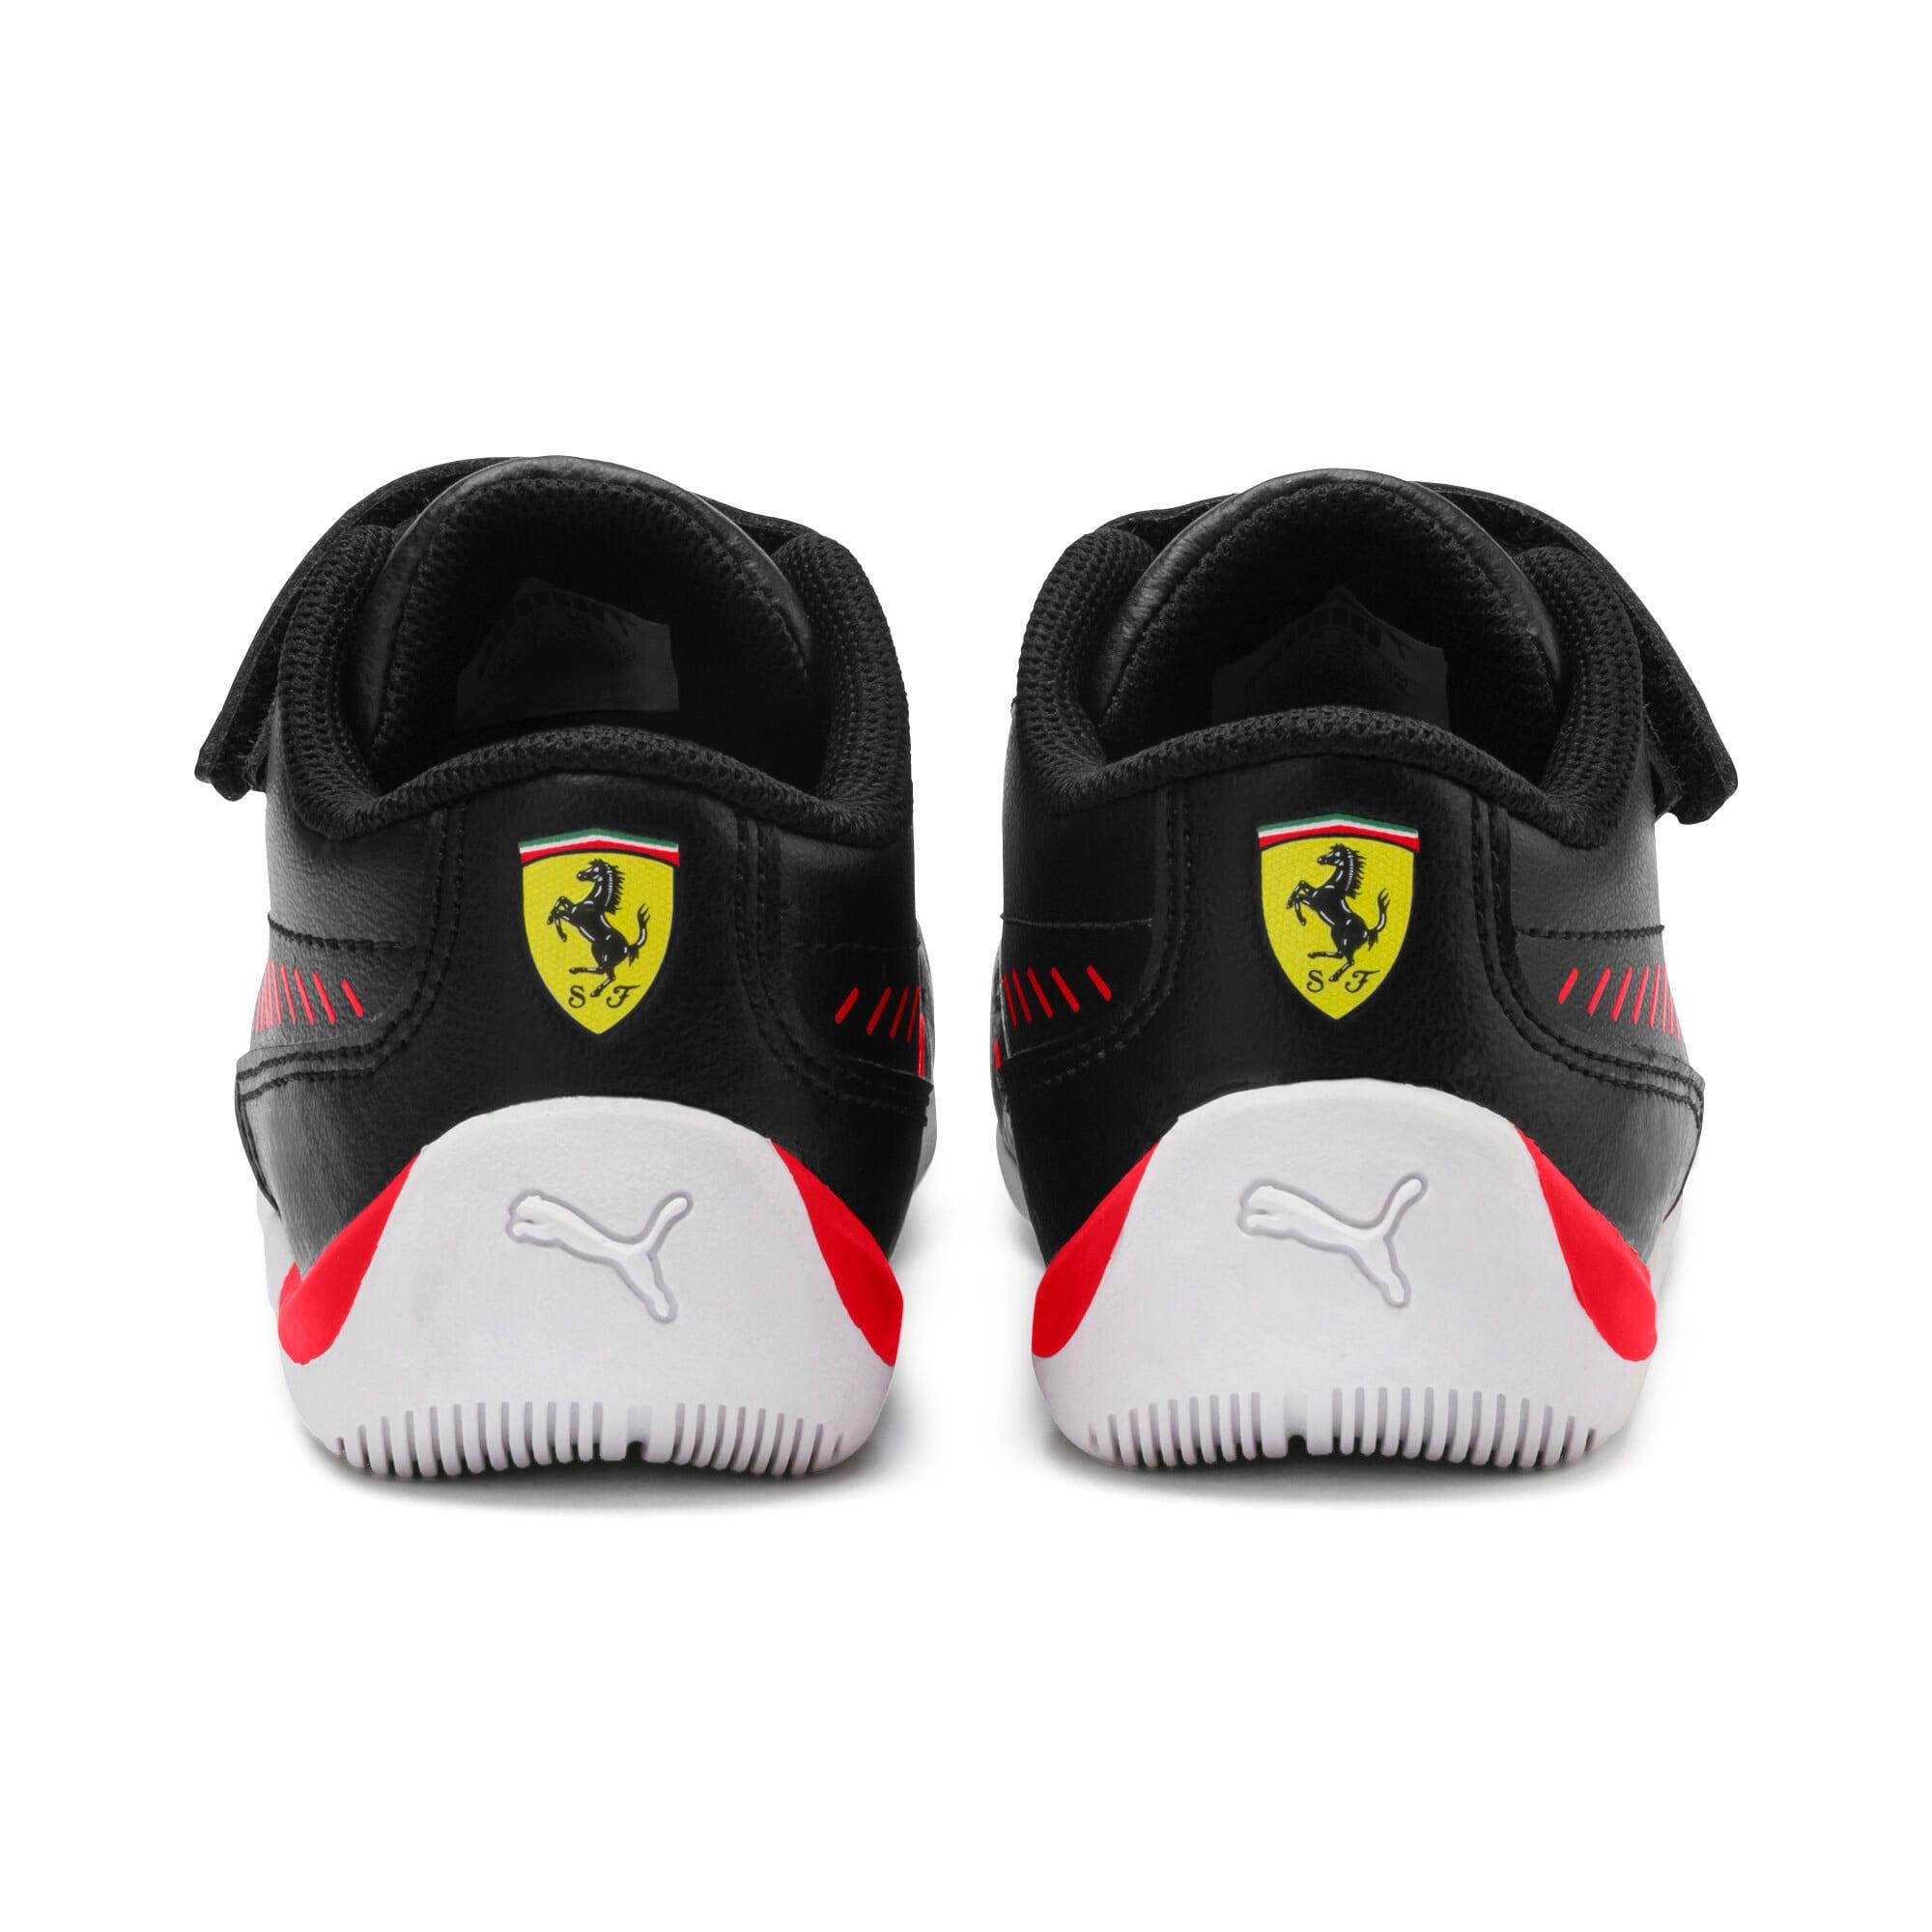 Thumbnail 3 of Ferrari Drift Cat 7S Ultra Kids' Trainers, Puma Black-Rosso Corsa, medium-SEA